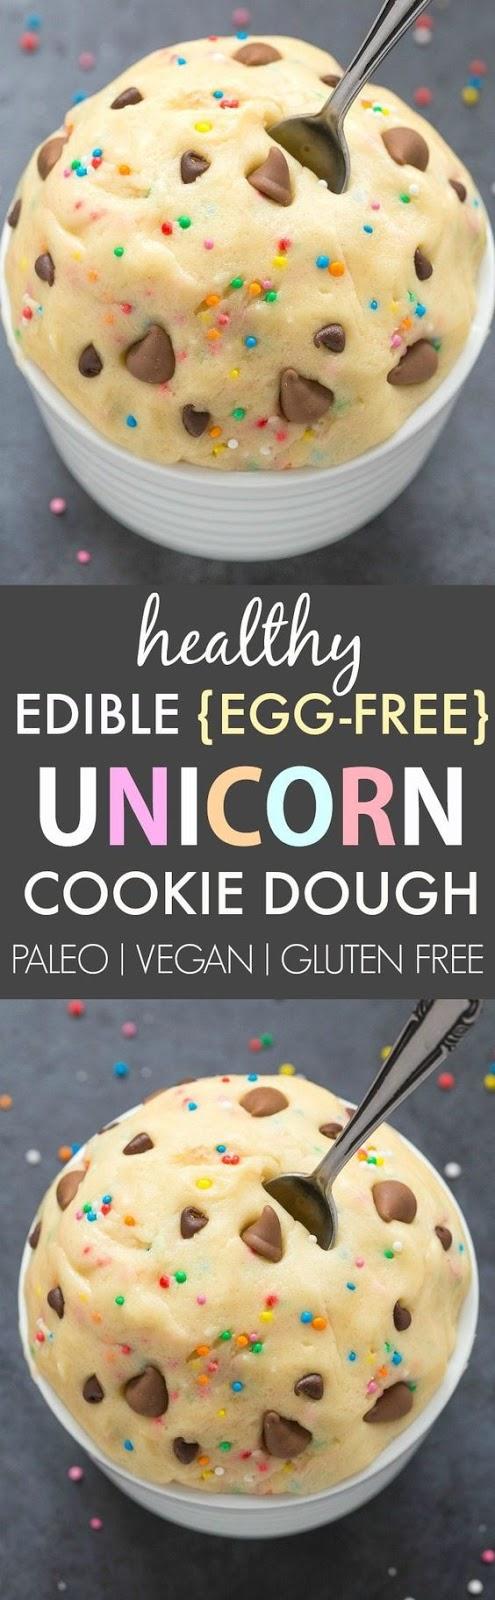 Healthy Edible Egg-Free Unicorn Cookie Dough